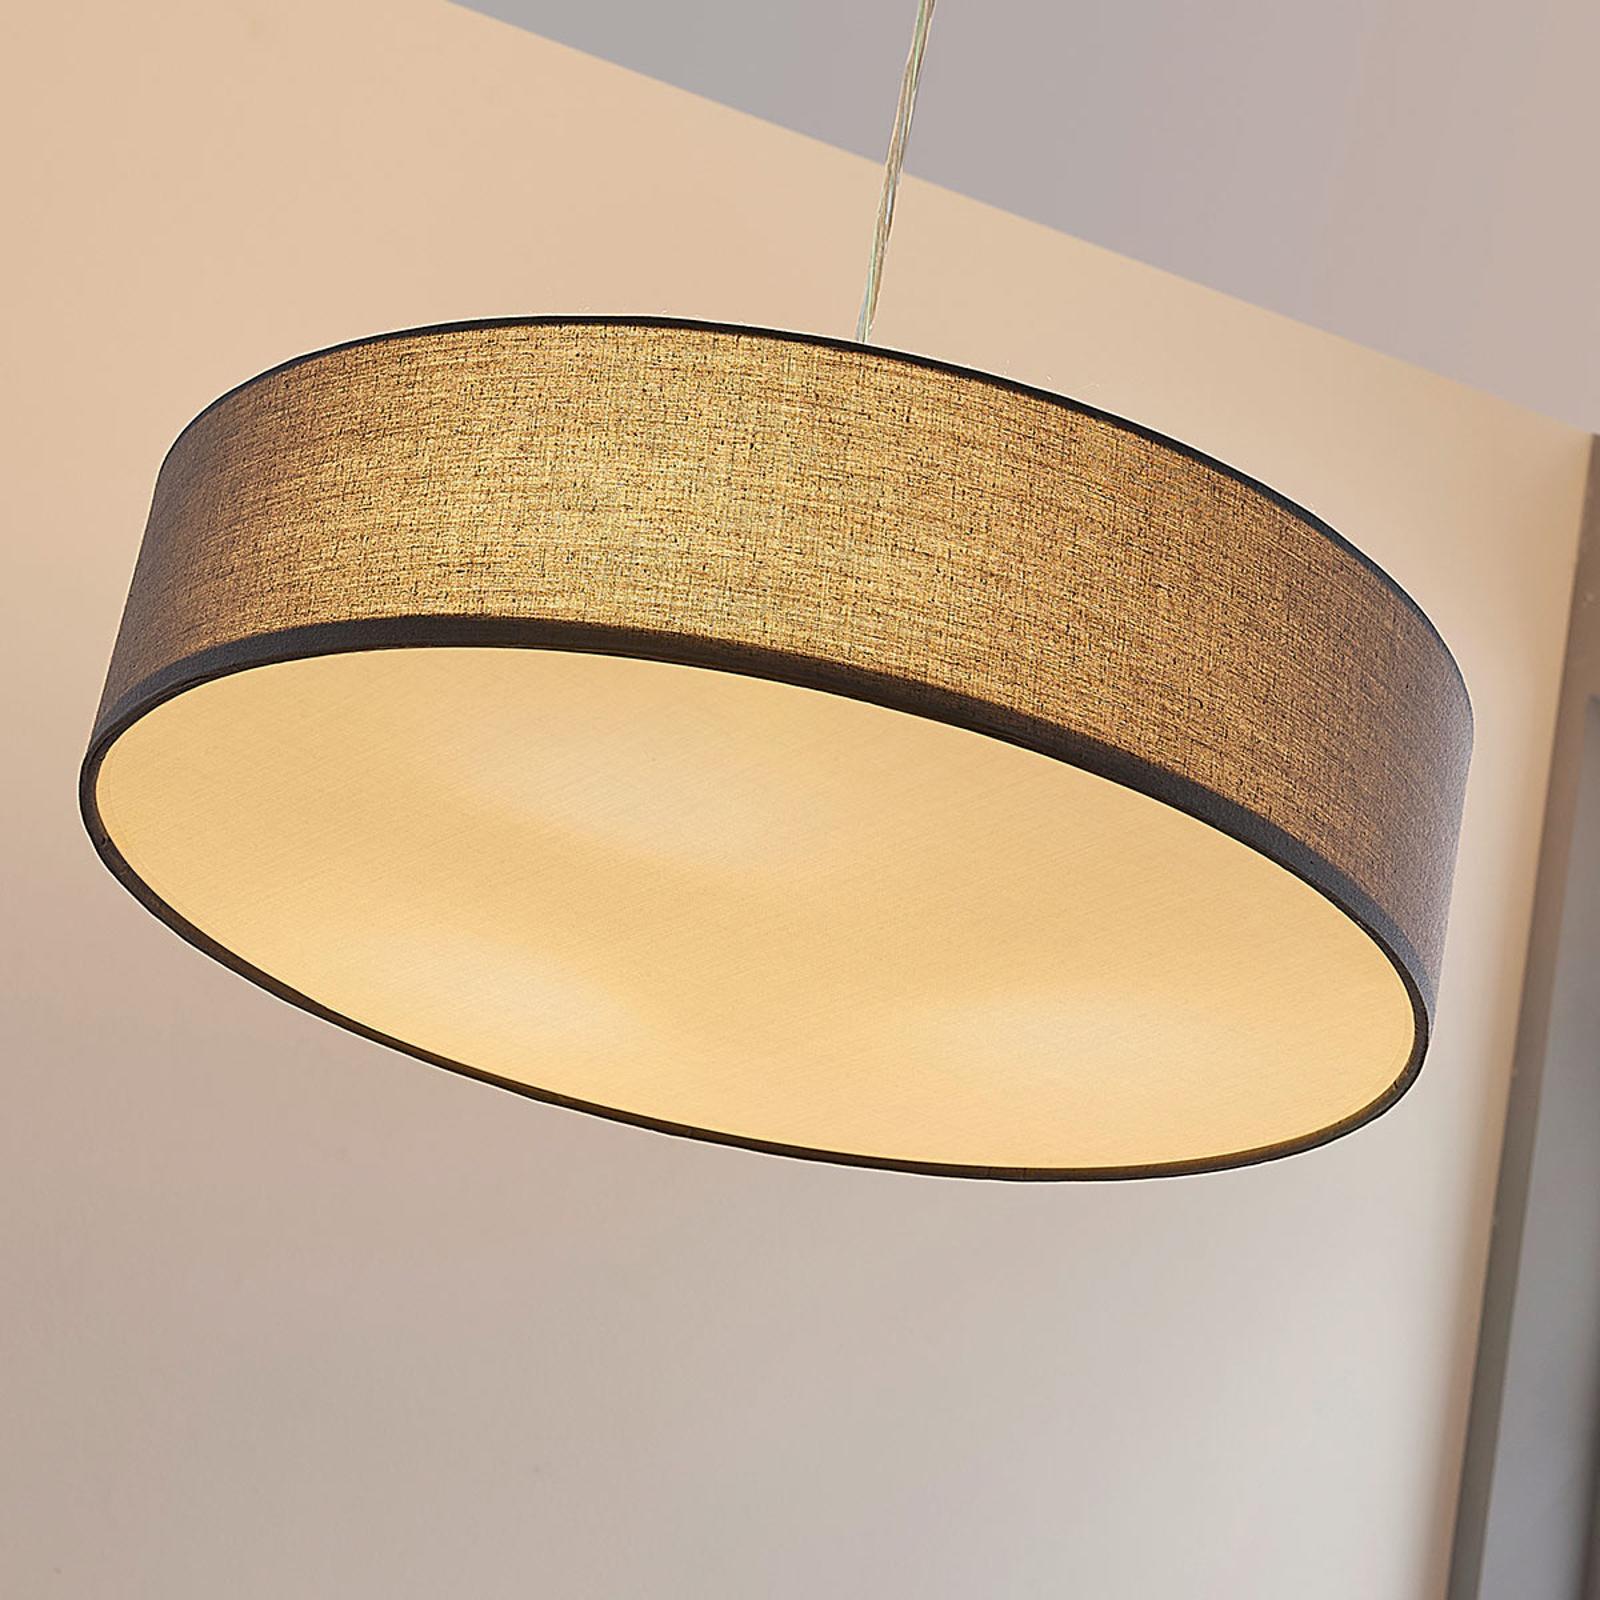 Tygtaklampa Sebatin i grått m. E27 LED lampor | Lamp24.se